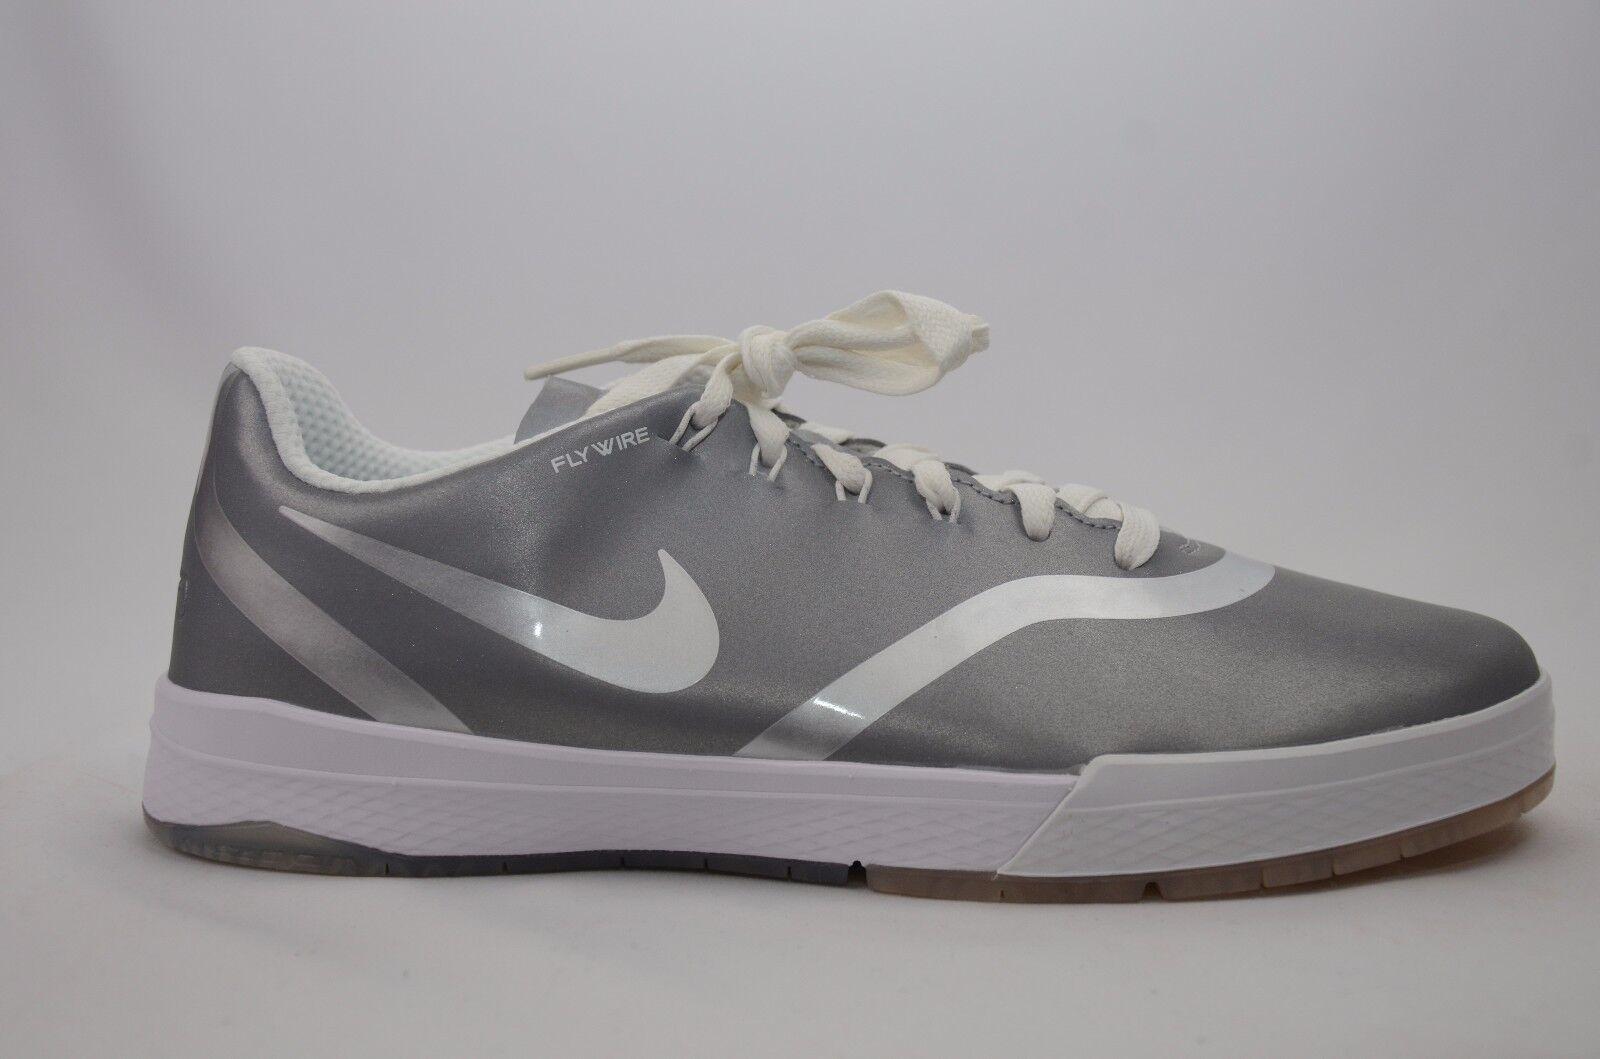 ed11fc1bf331 Nike SB Paul Rodriguez 9 Elite Flash Shoes Metallic Silver 833902 ...